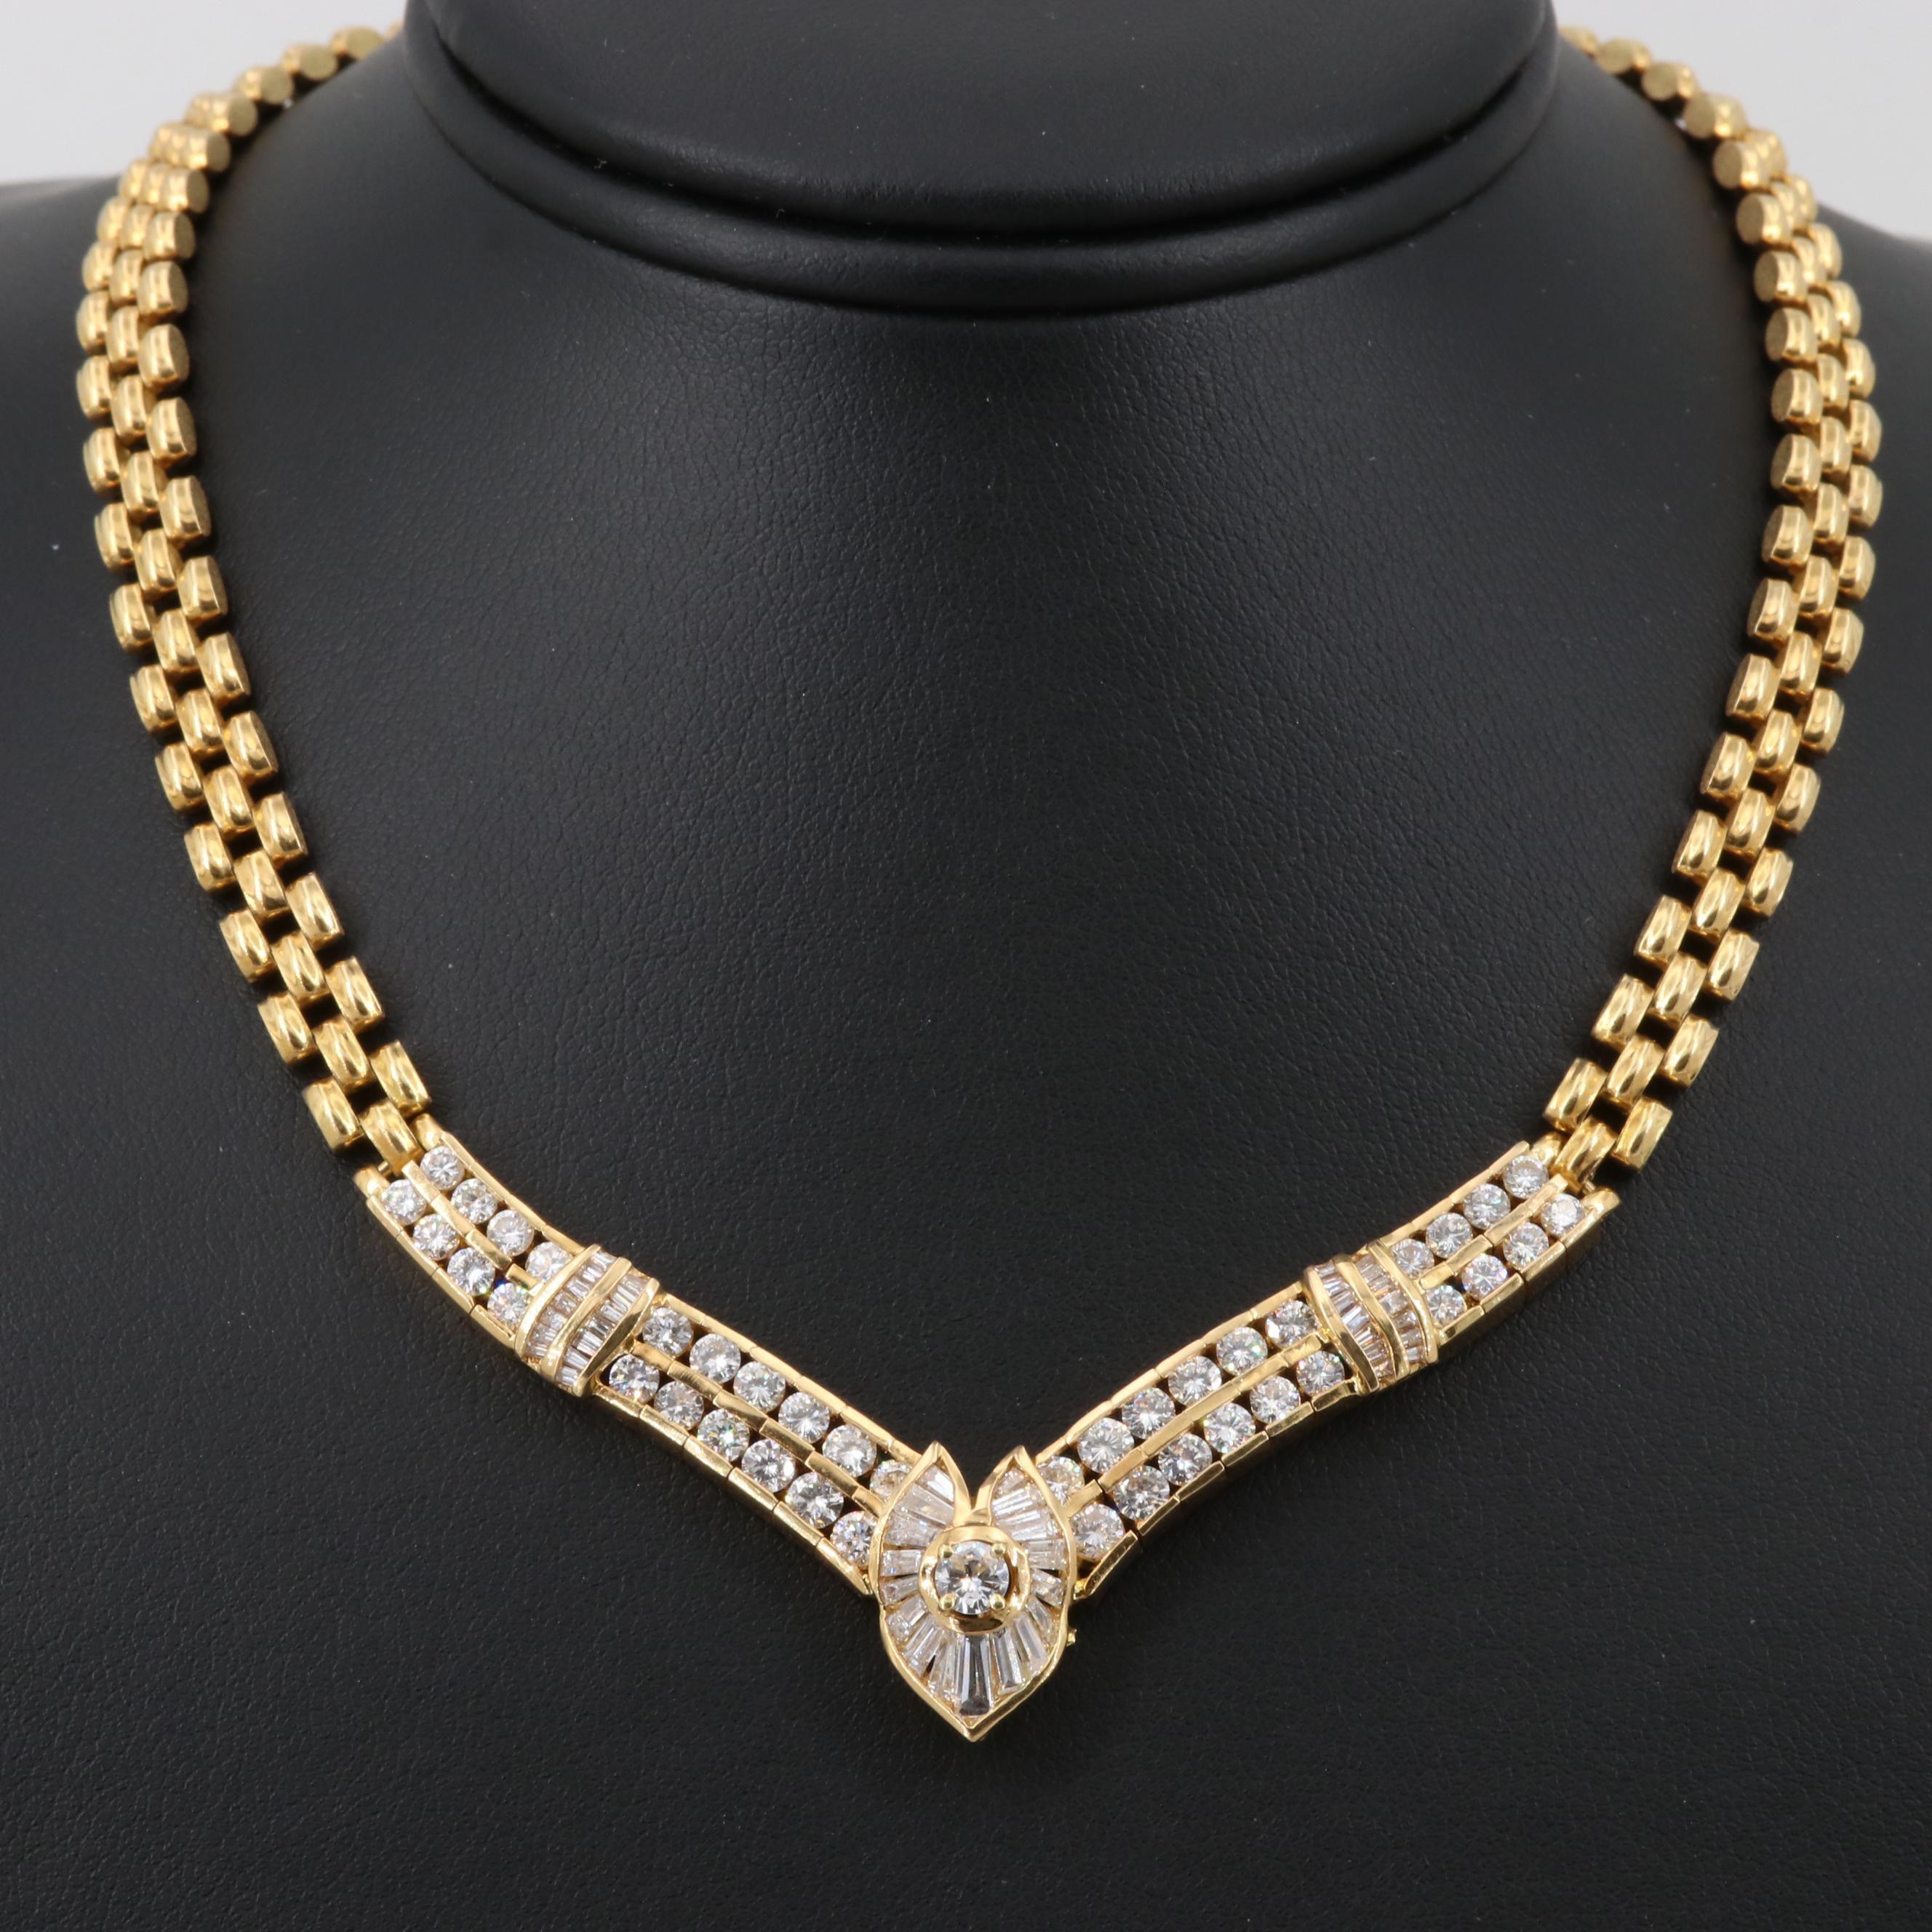 18K Yellow Gold 4.77 CTW Diamond Chevron Necklace